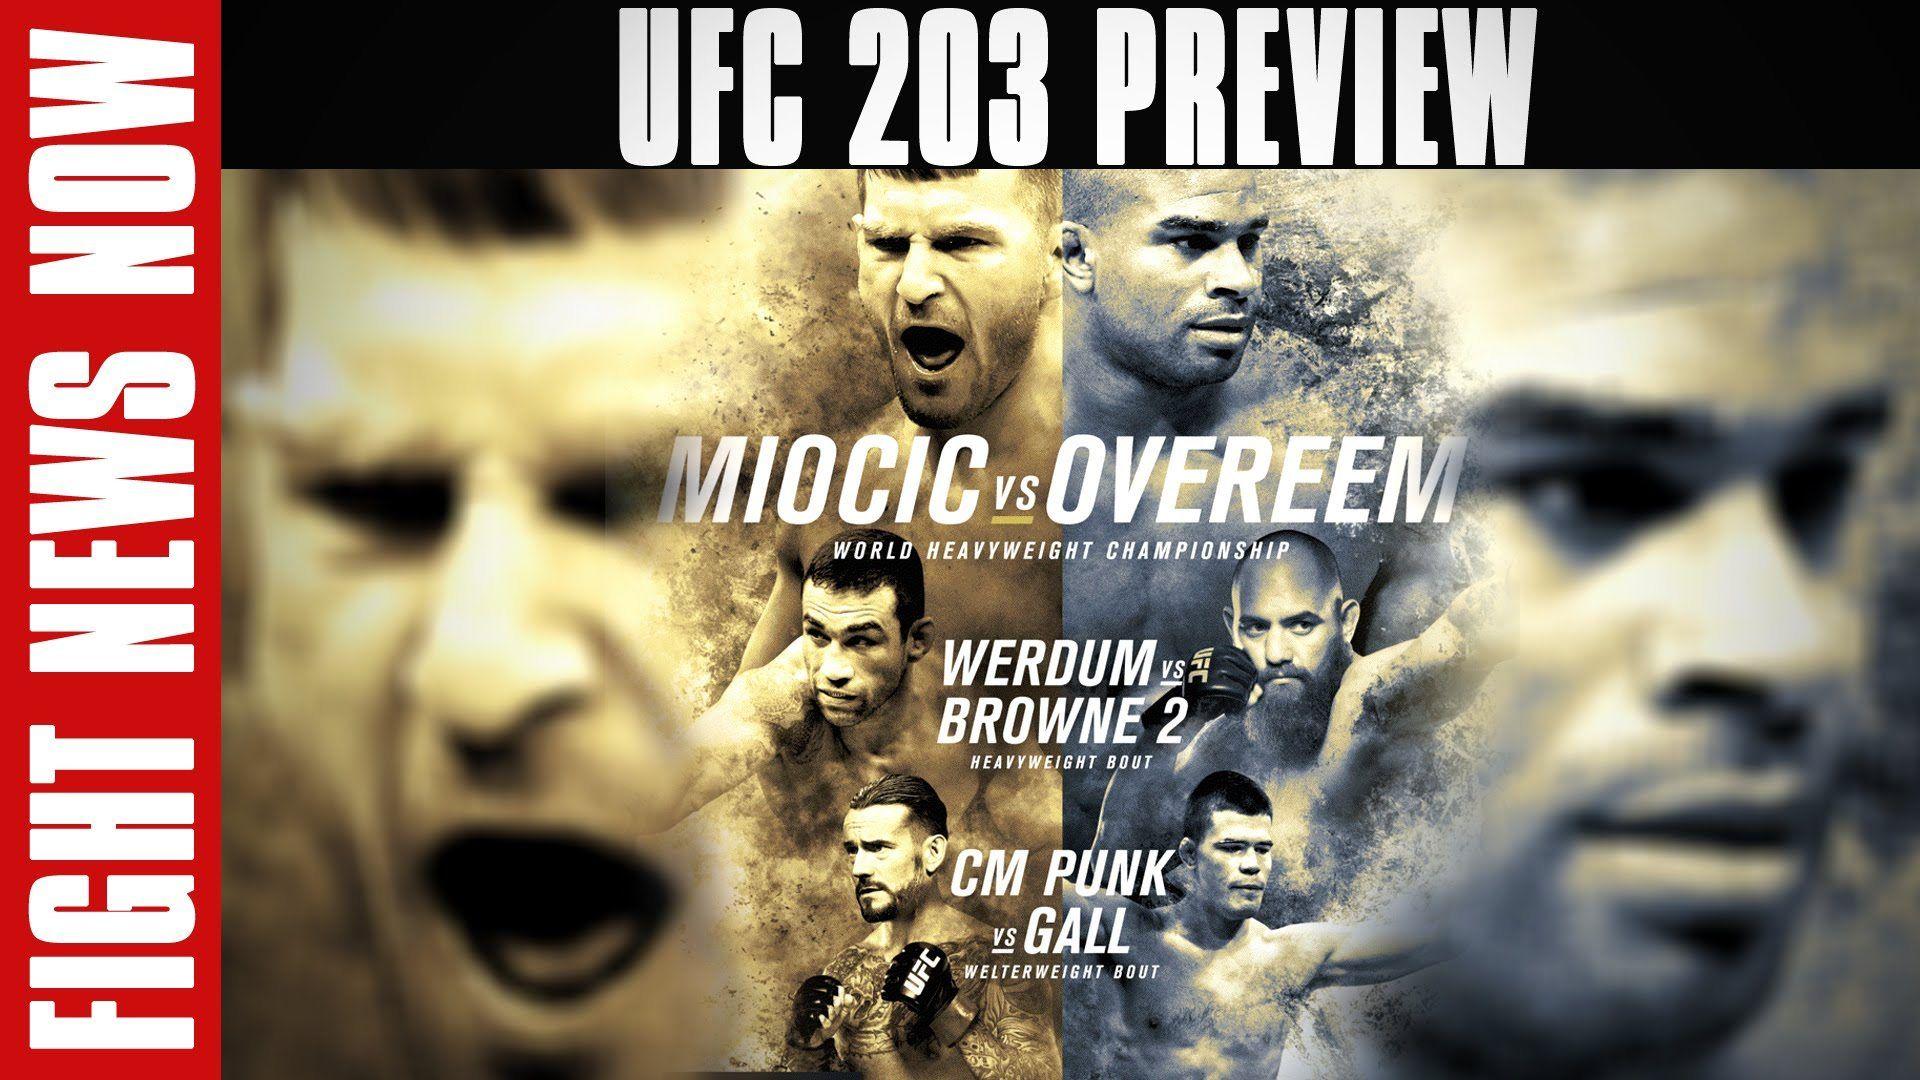 Cool Ufc 203 Stipe Miocic Vs Alistair Overeem Fabricio Werdum Vs Travis Browne On Battle News Now Ufc Stipe Miocic Good Movies